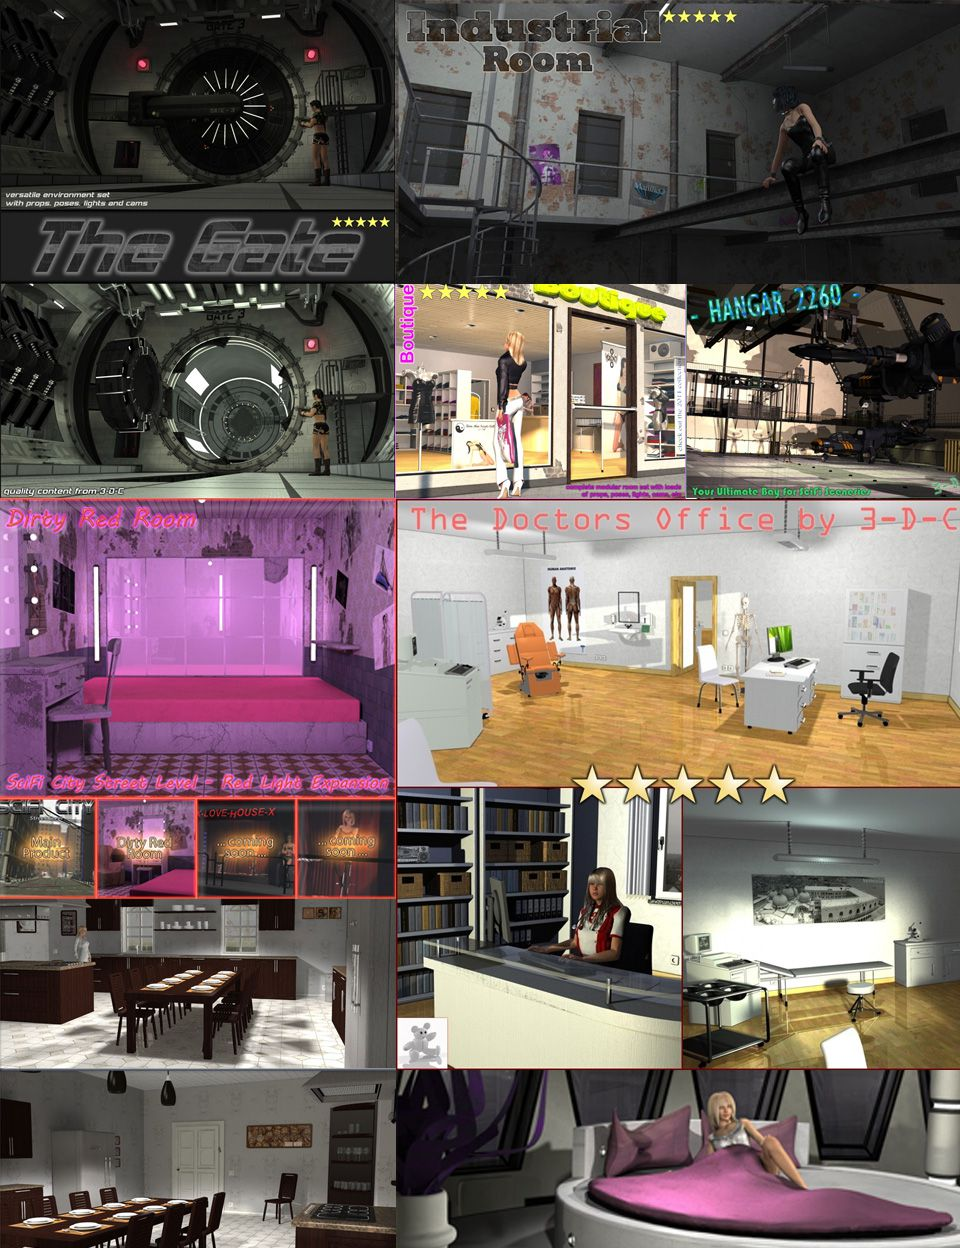 3-d-c Collection Pack_DAZ3D下载站